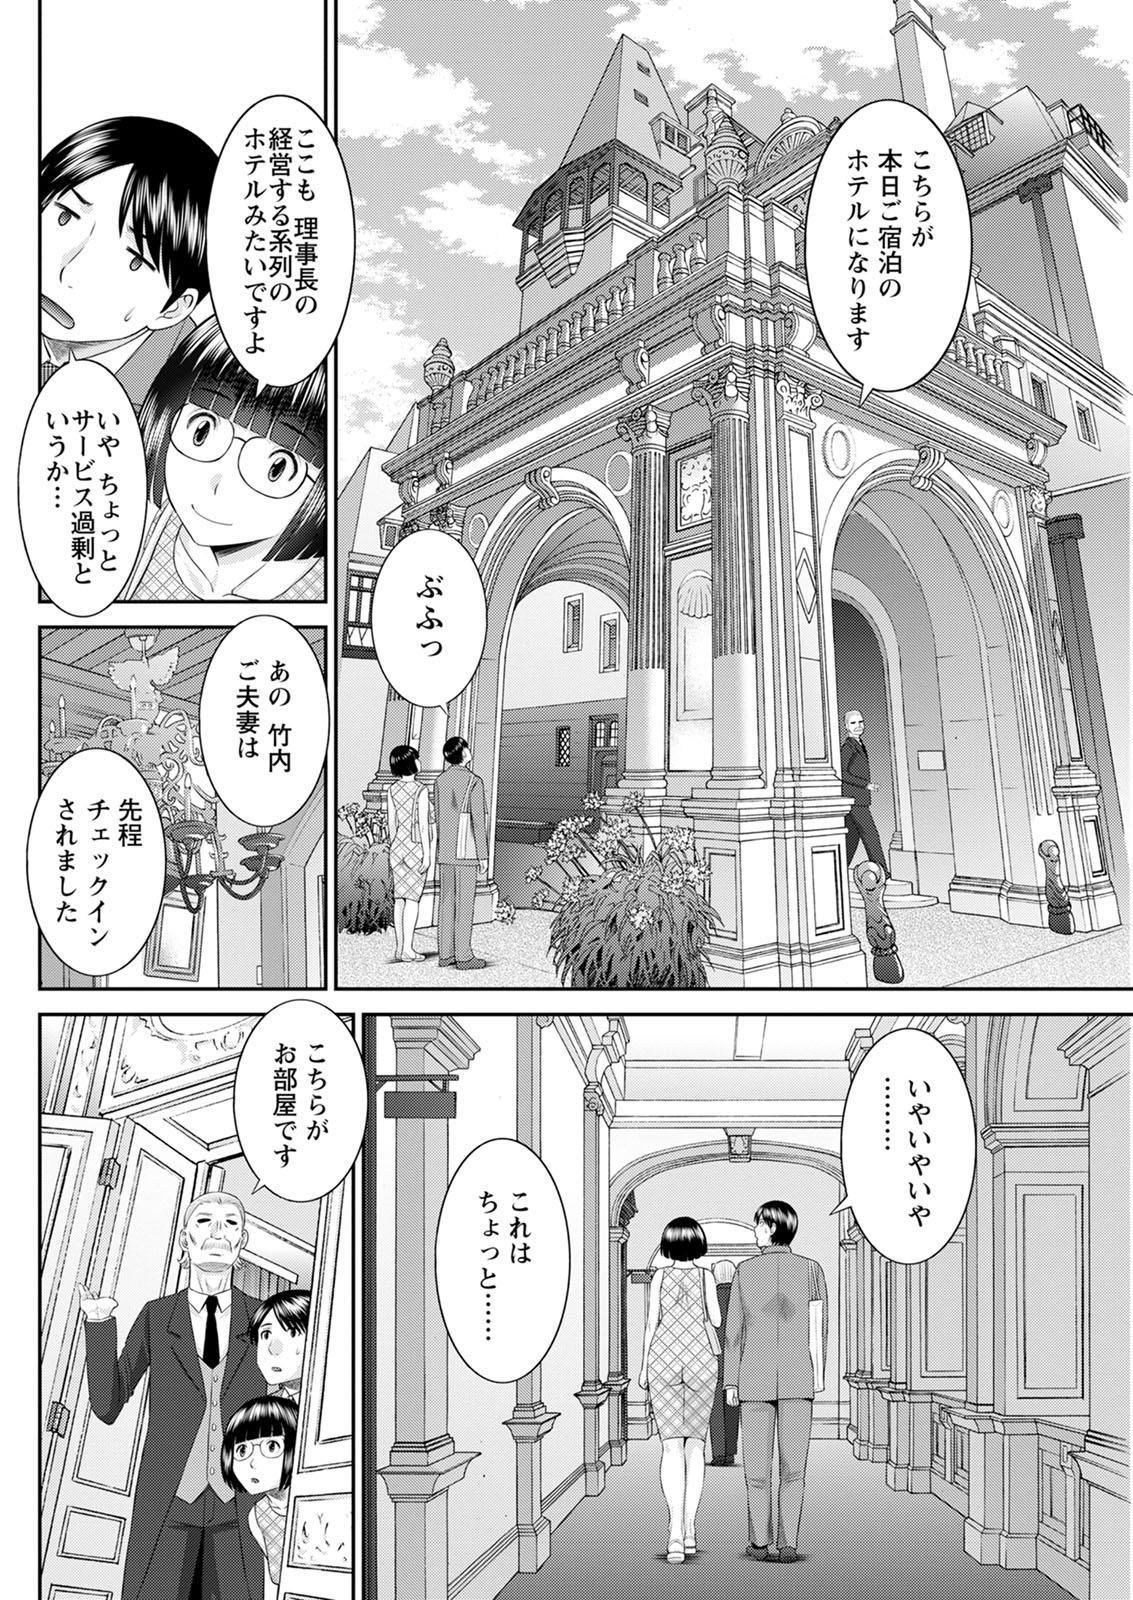 [Kawamori Misaki] Kaikan Hitotsuma Gakuen Ch. 1-6, 8-20 [Digital] 336